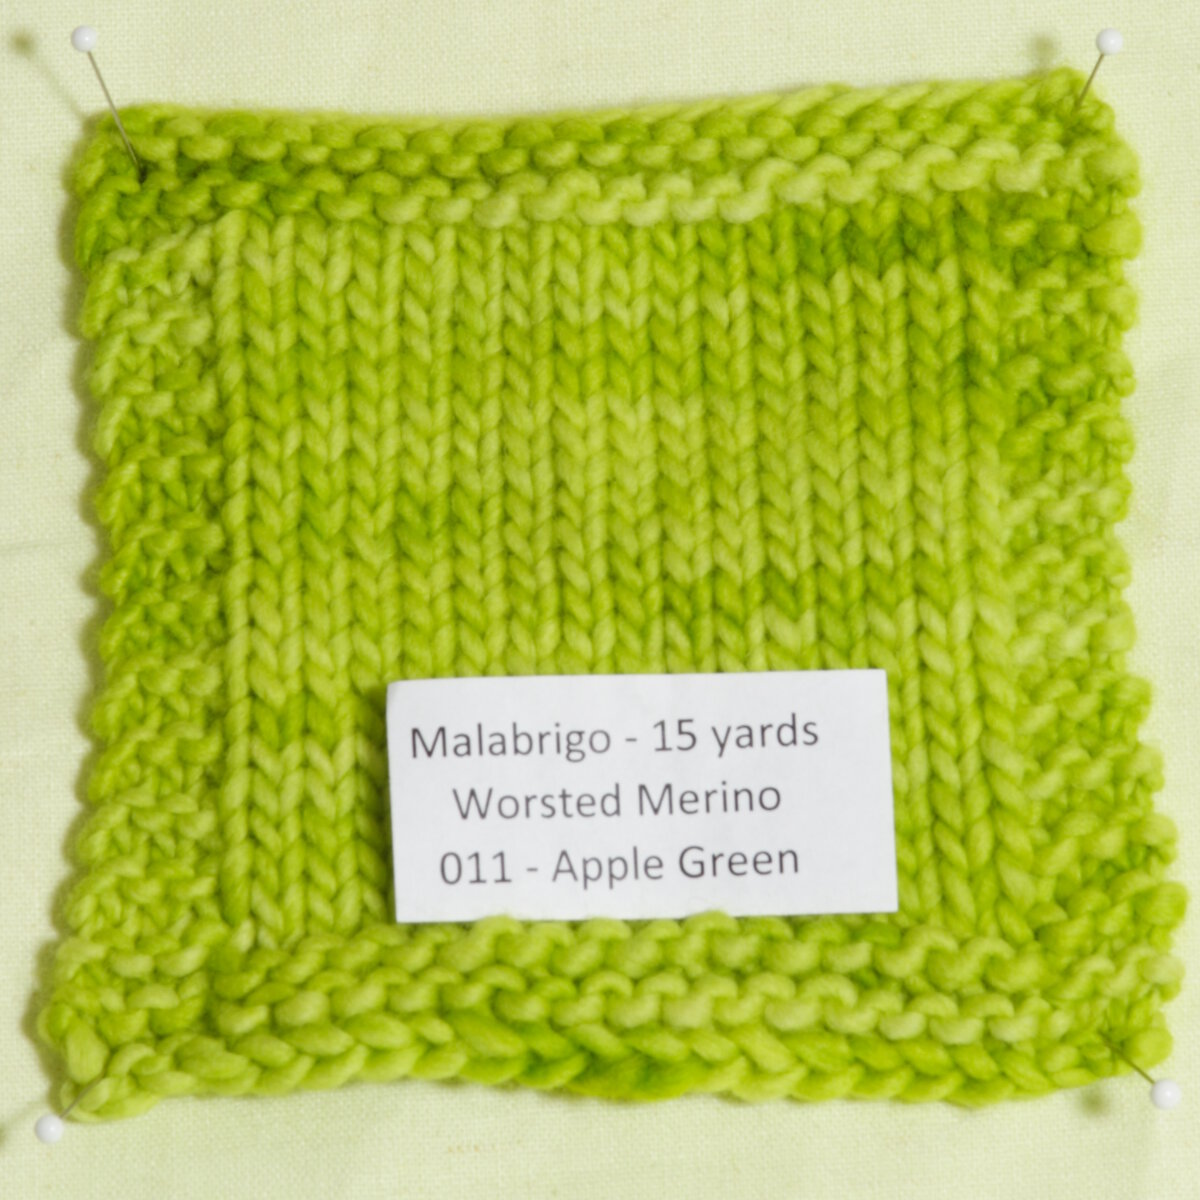 Malabrigo Knitting Patterns : Malabrigo Worsted Merino Yarn - 011 - Apple Green Detailed Description at Jim...